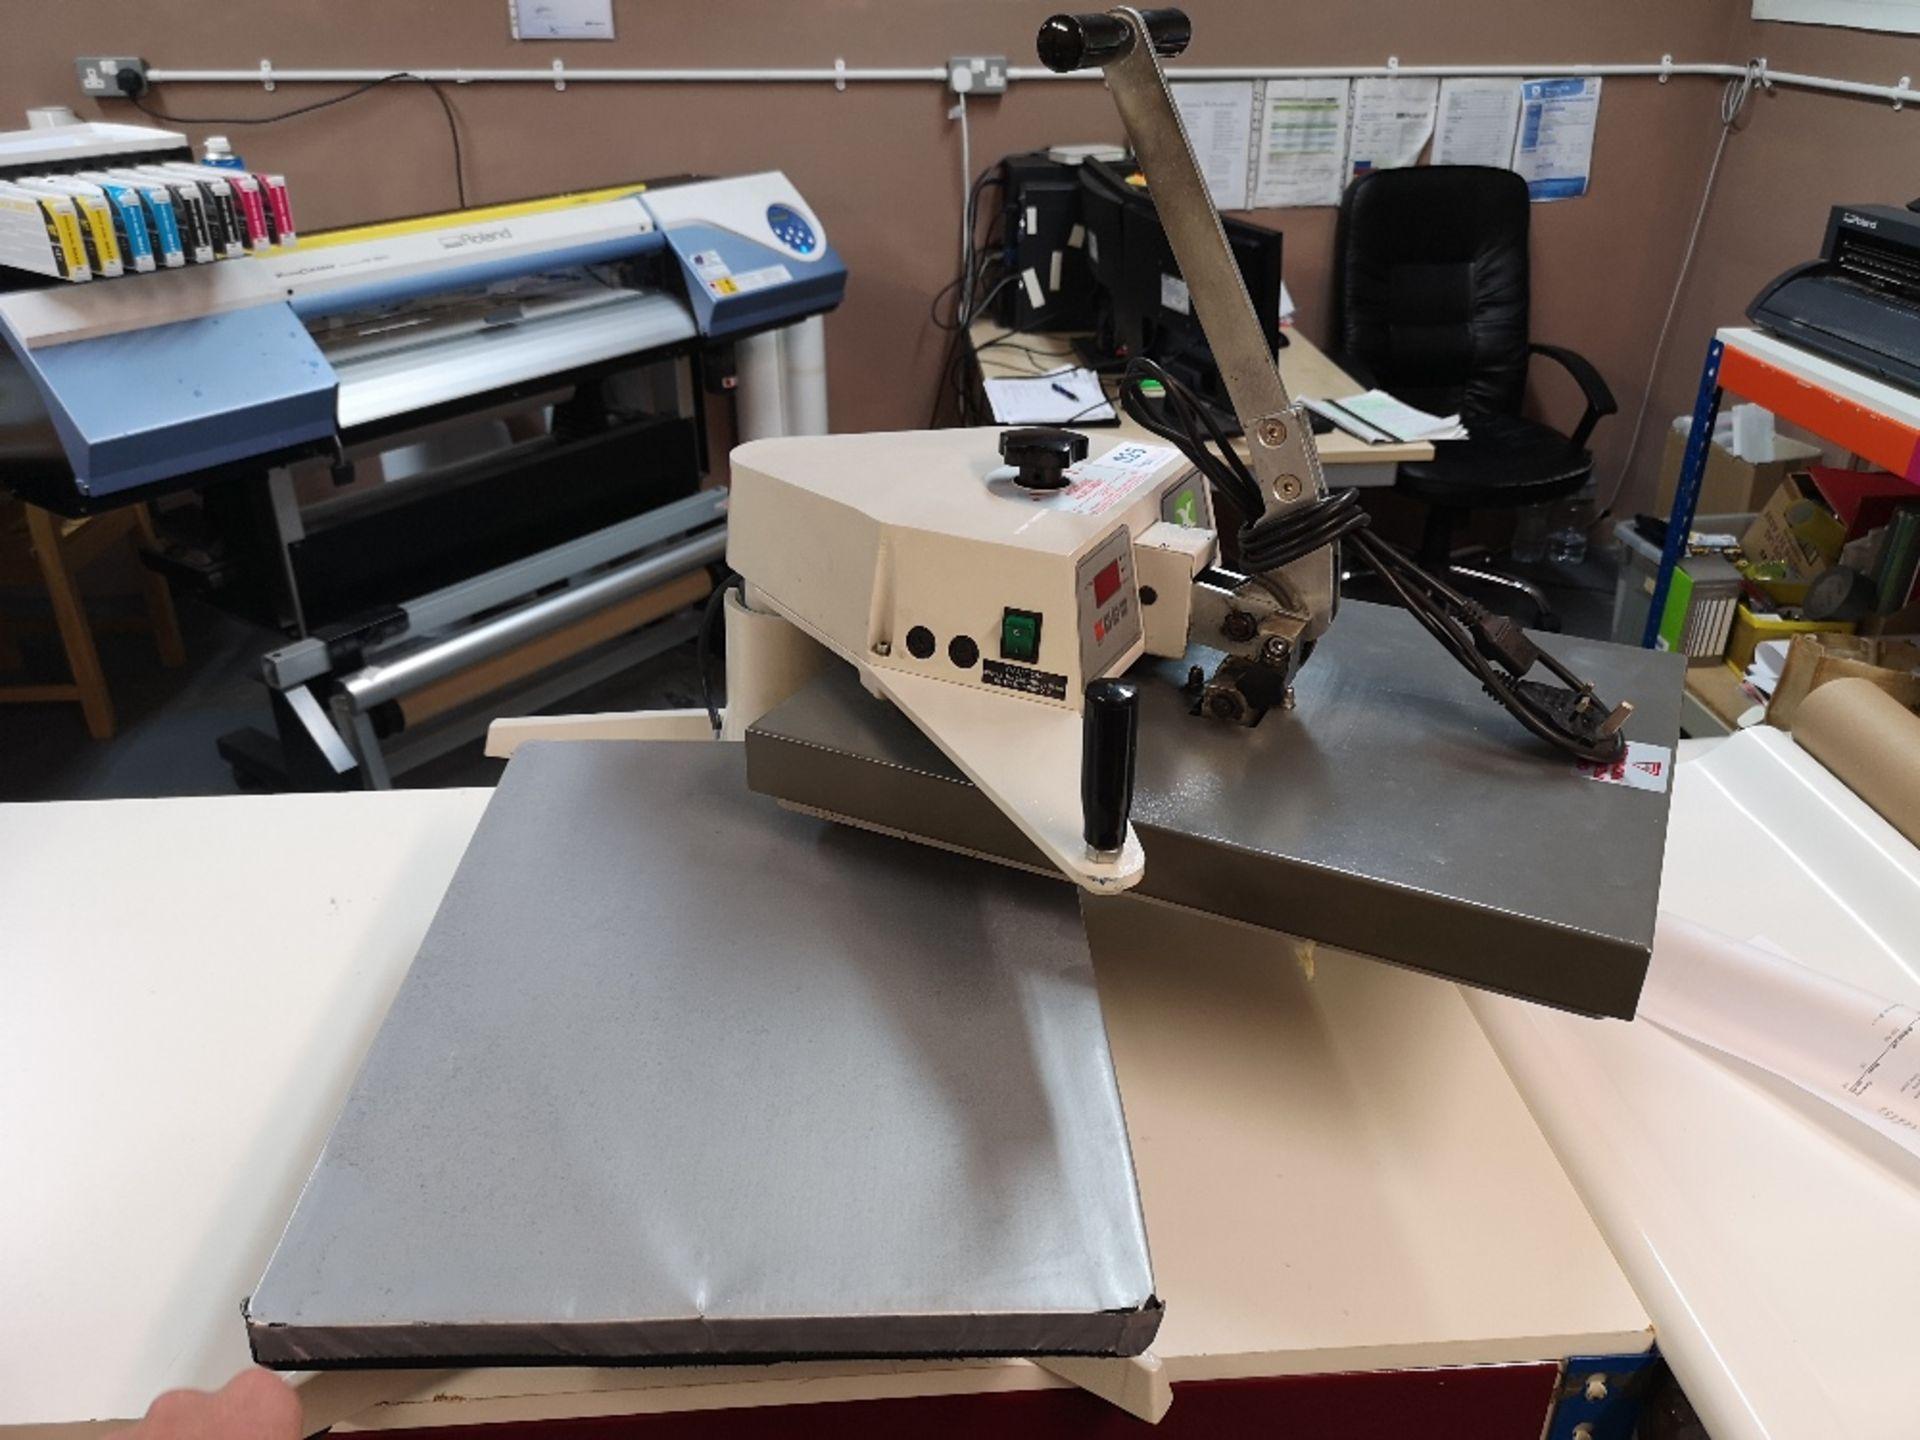 XPRES BMC20 Swing Press T-Shirt Printing Machine (2017) - Image 3 of 4